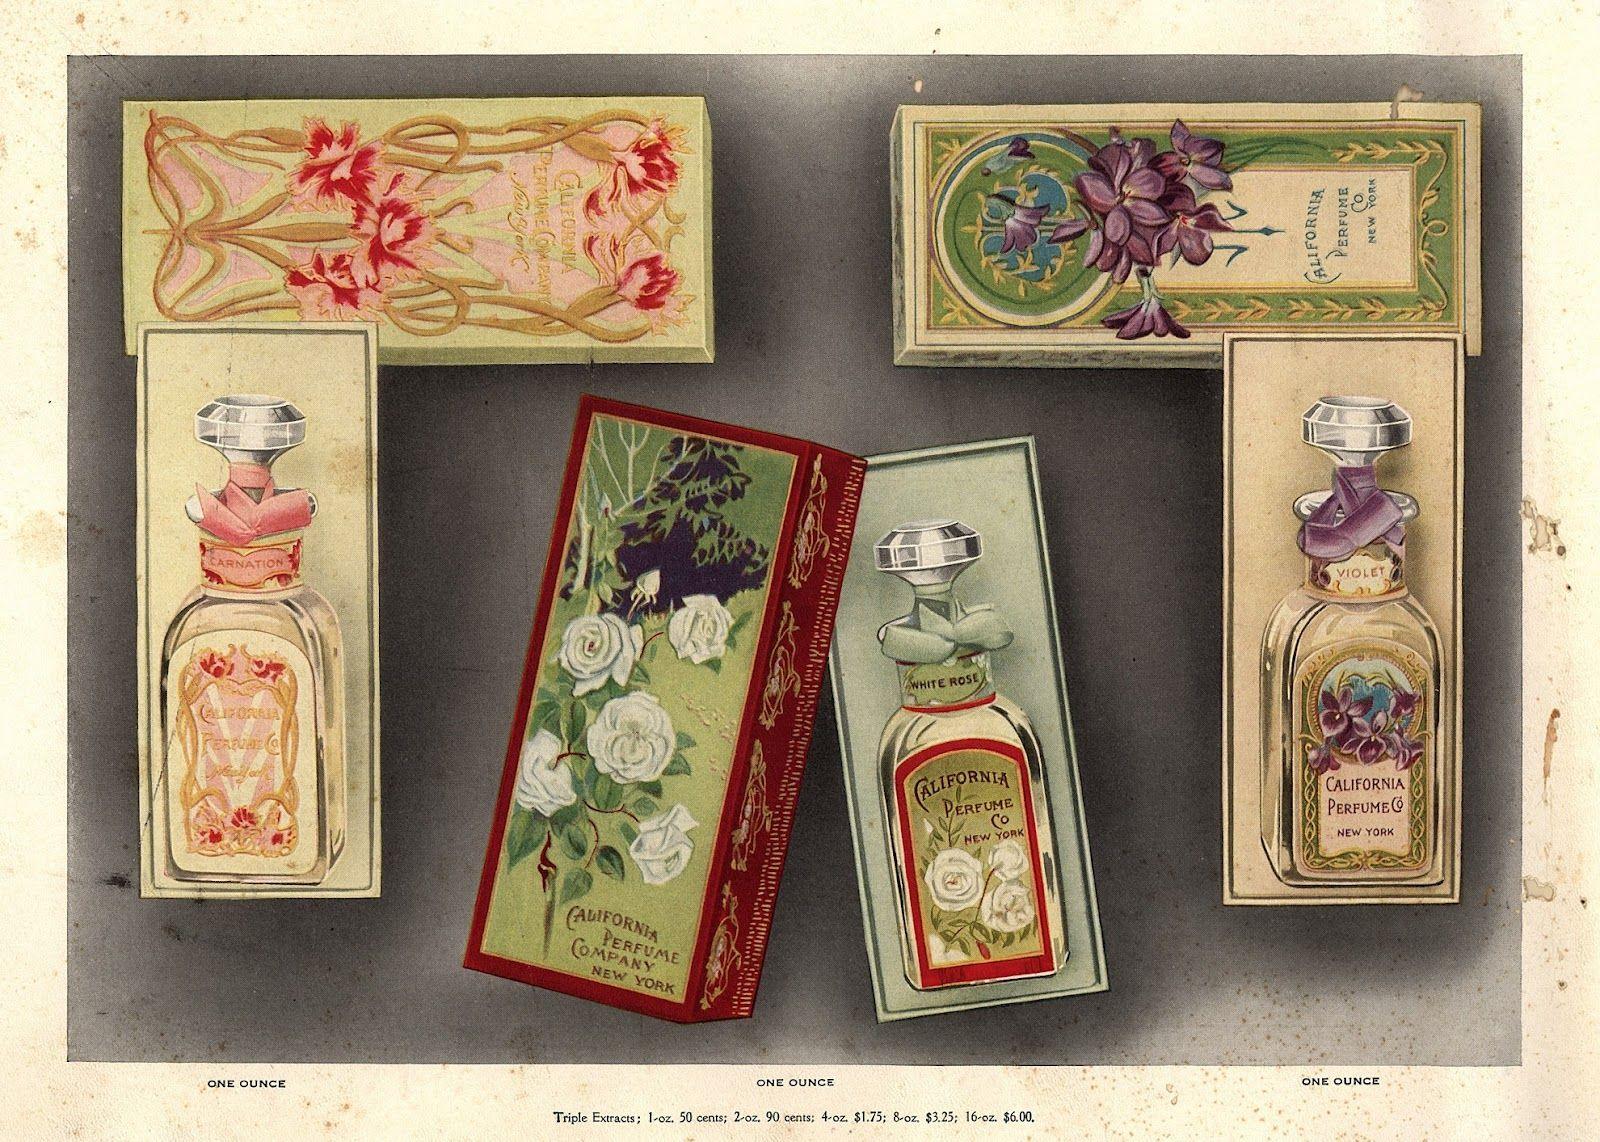 vintage perfume ads | FREE ViNTaGE DiGiTaL STaMPS**: Vintage Printable - Perfume Bottles